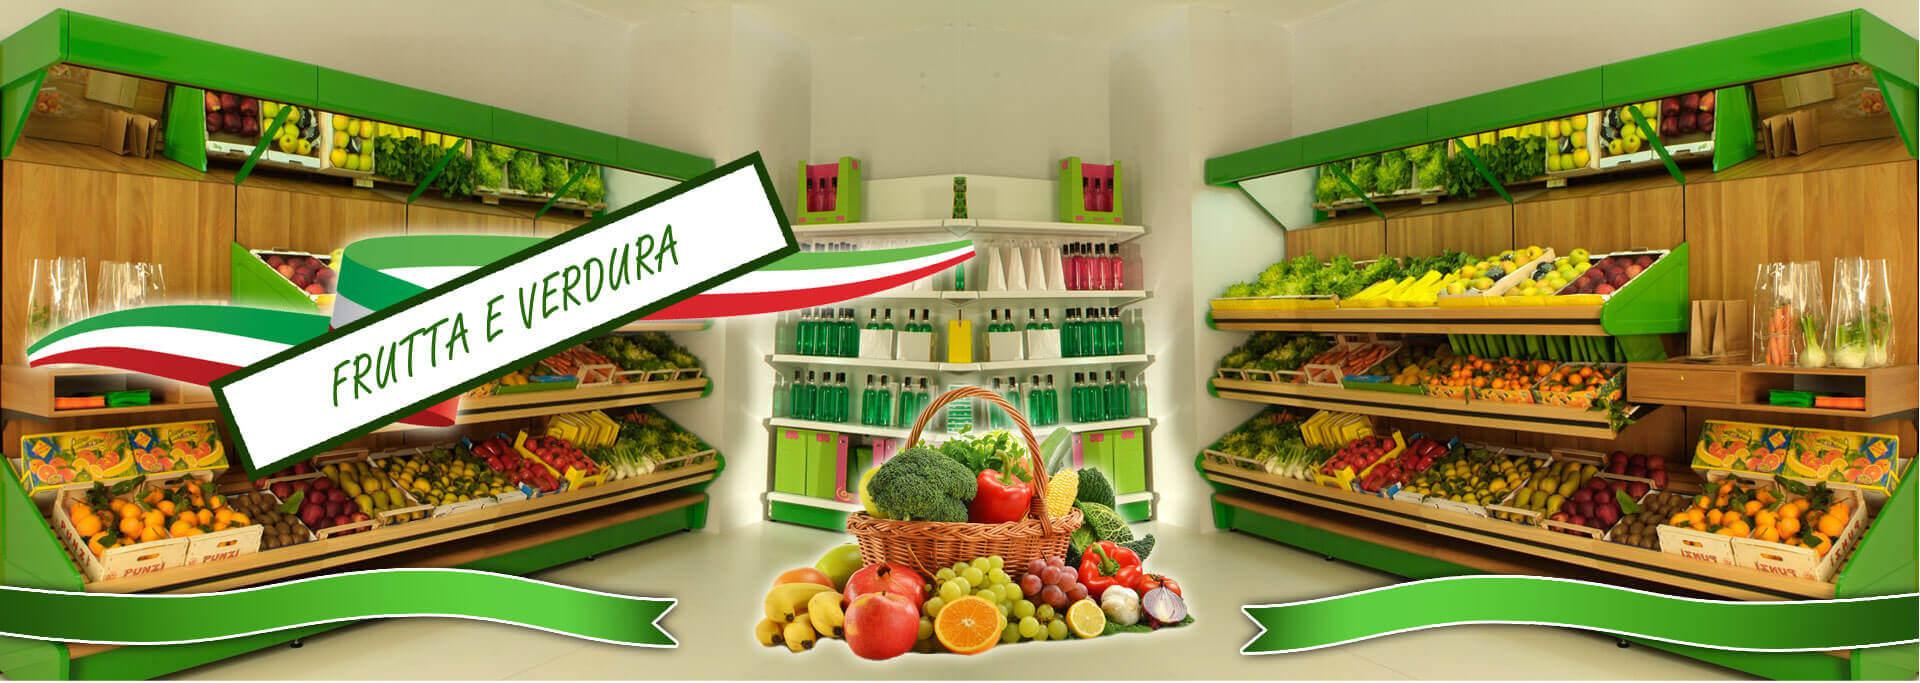 Arredamenti per negozi di frutta e verdura alimentari in for Arredamento frutta e verdura